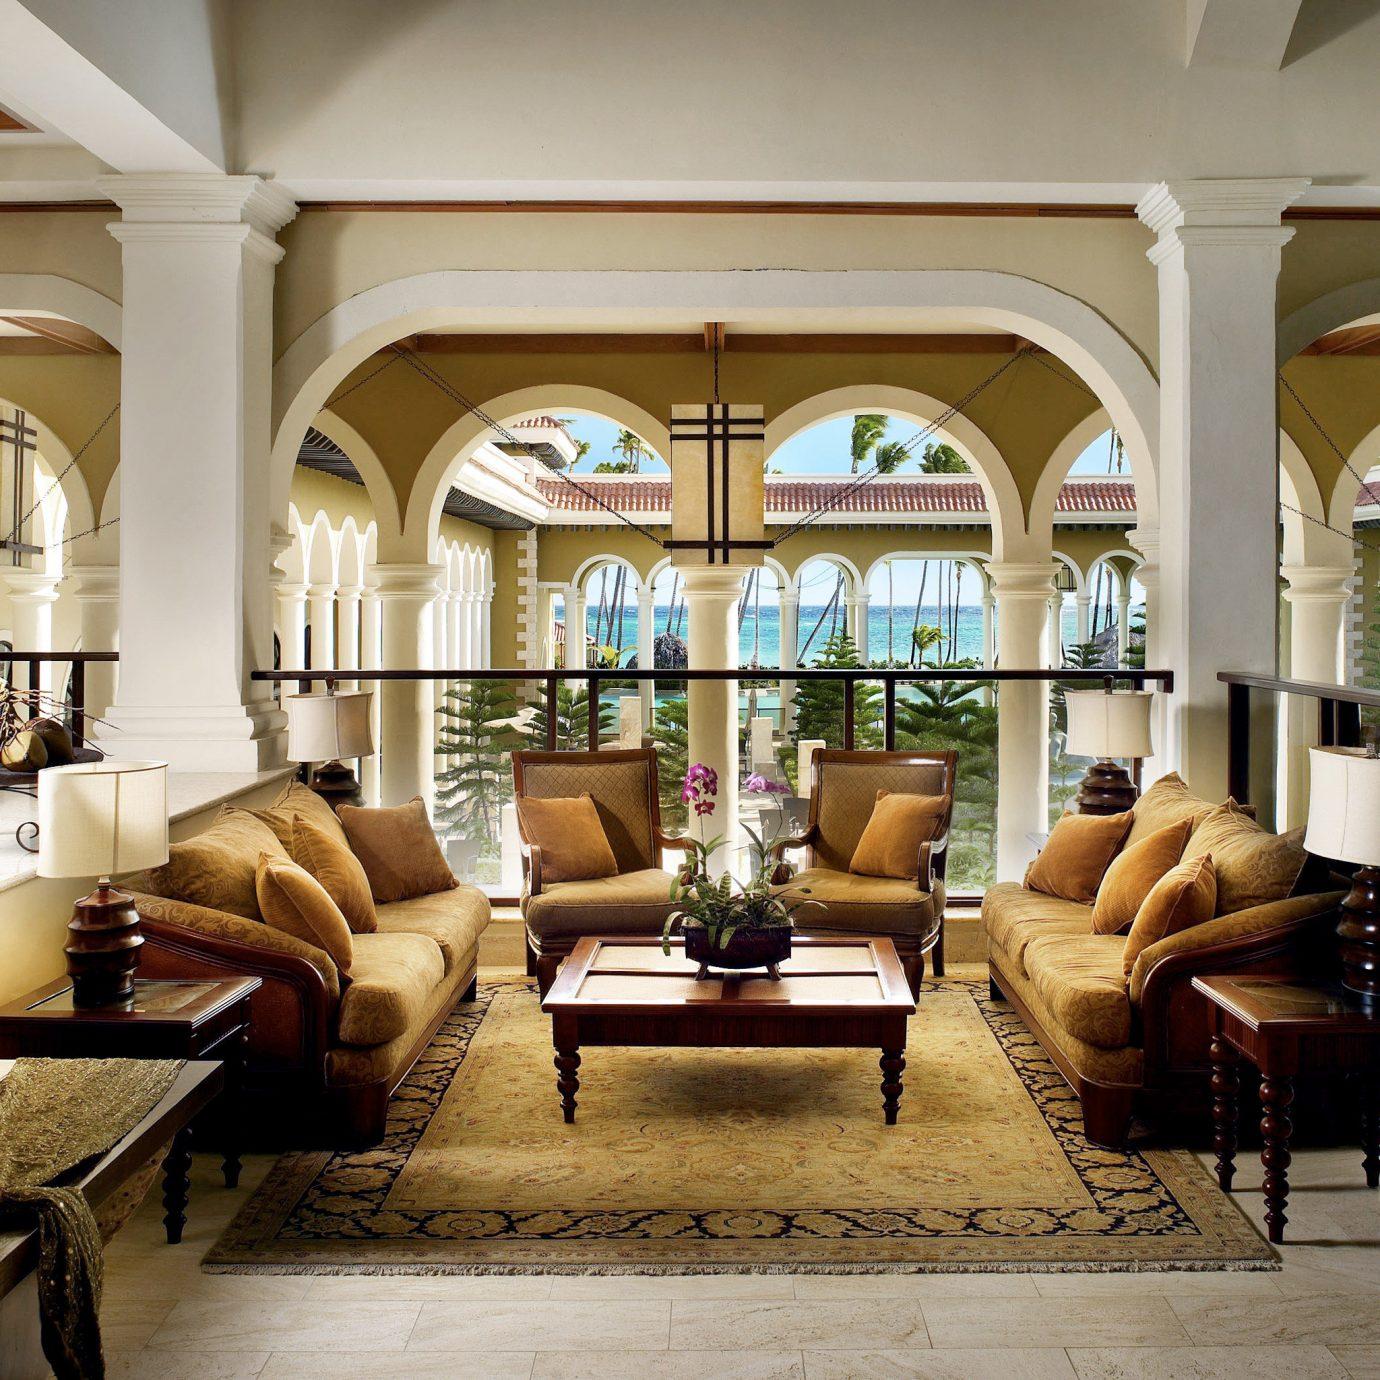 All-inclusive Family Hotels Lounge Luxury Resort Romantic sofa property living room home mansion Lobby condominium Villa porch